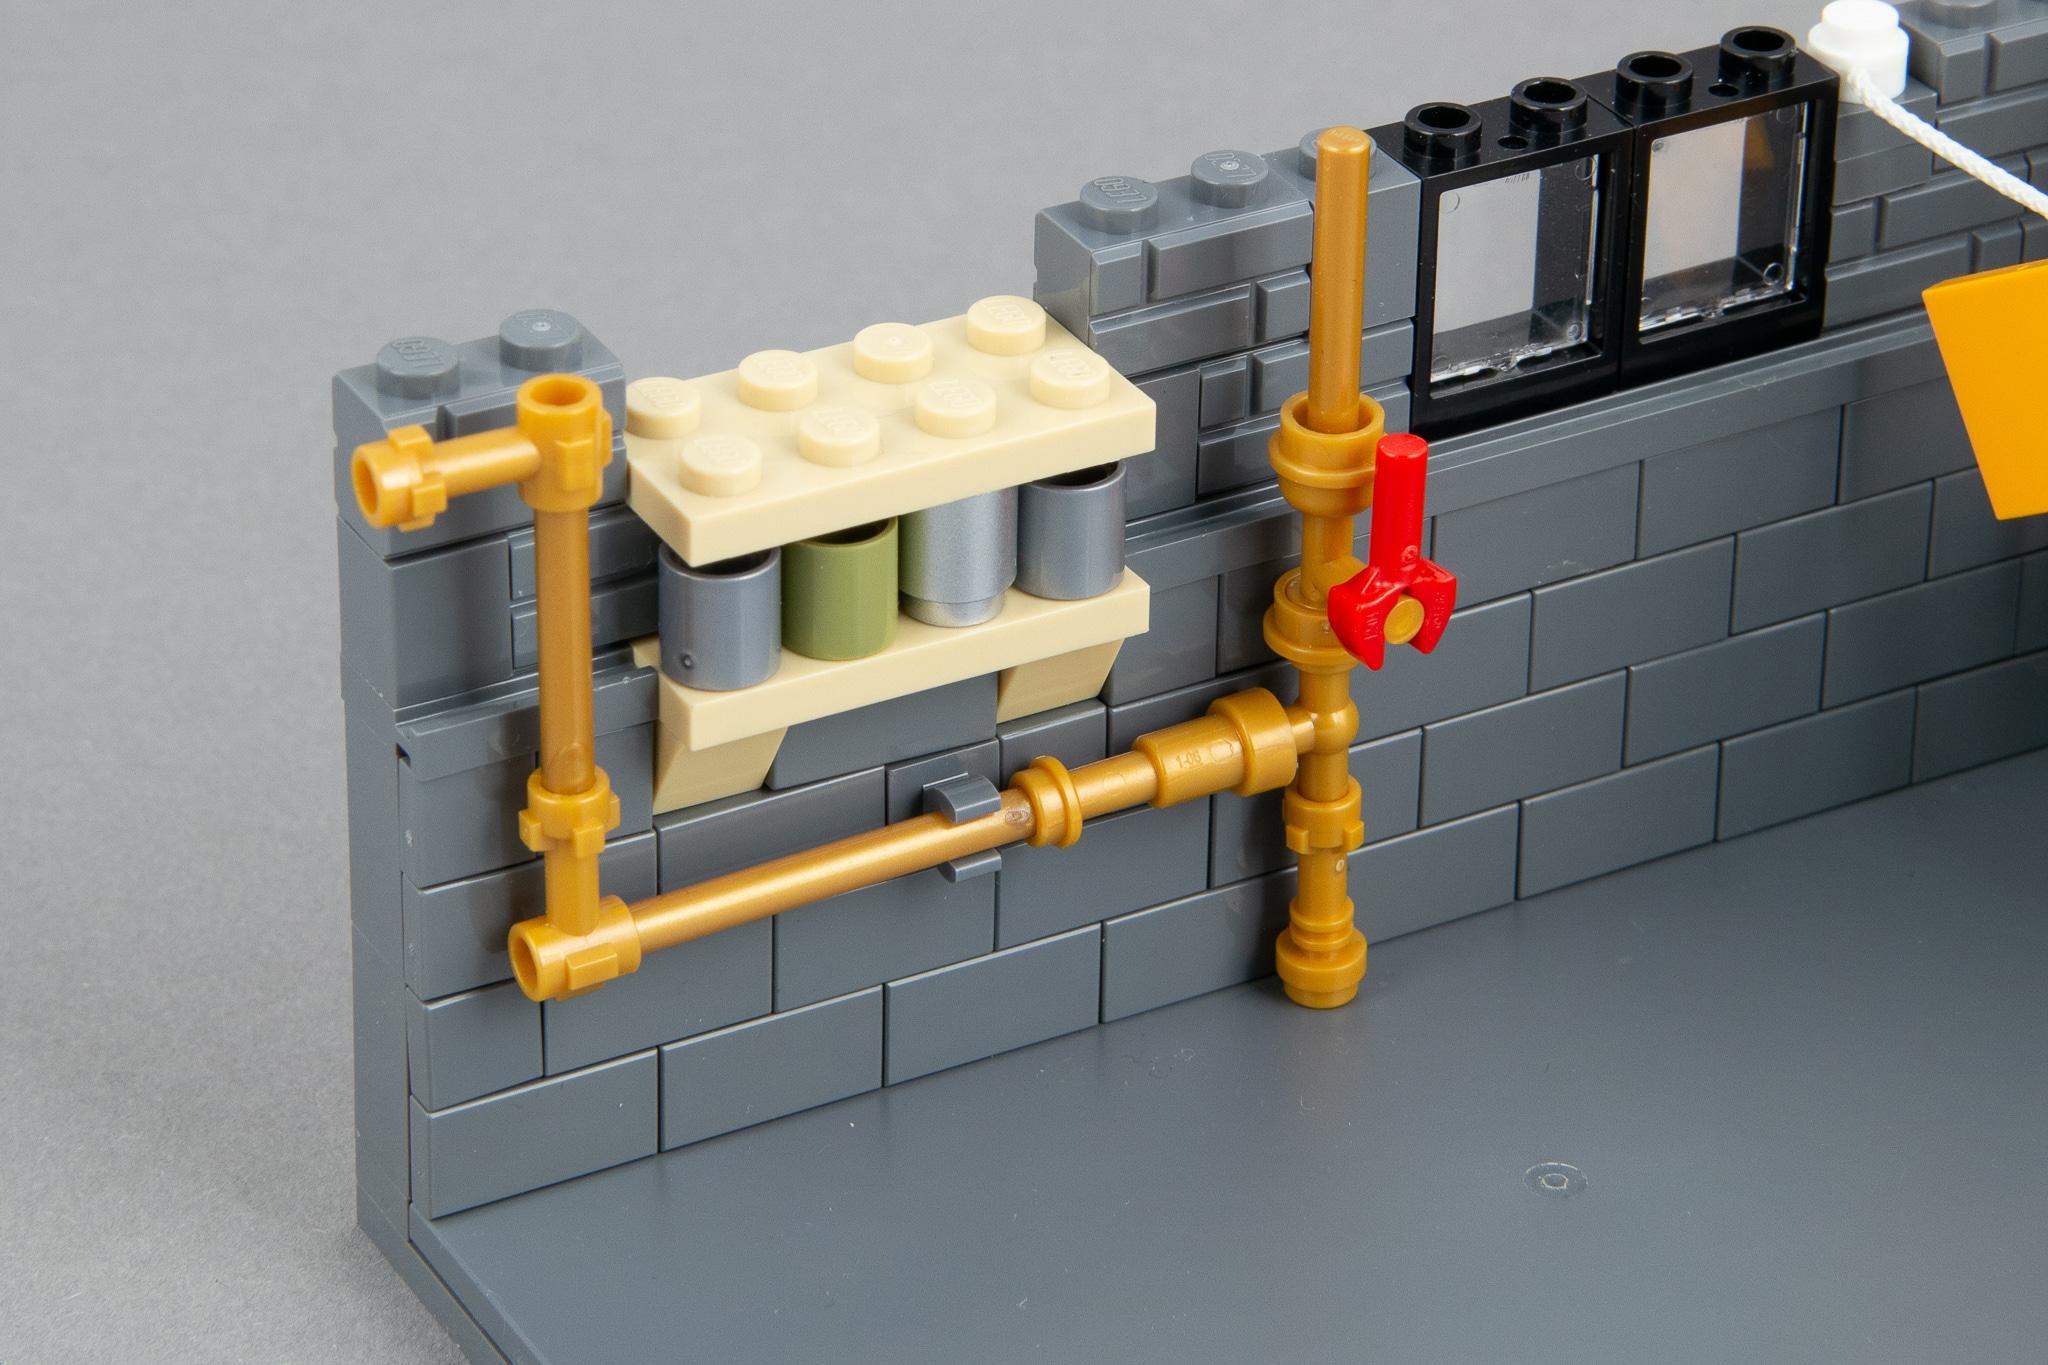 LEGO Moc Waschkeller (13)